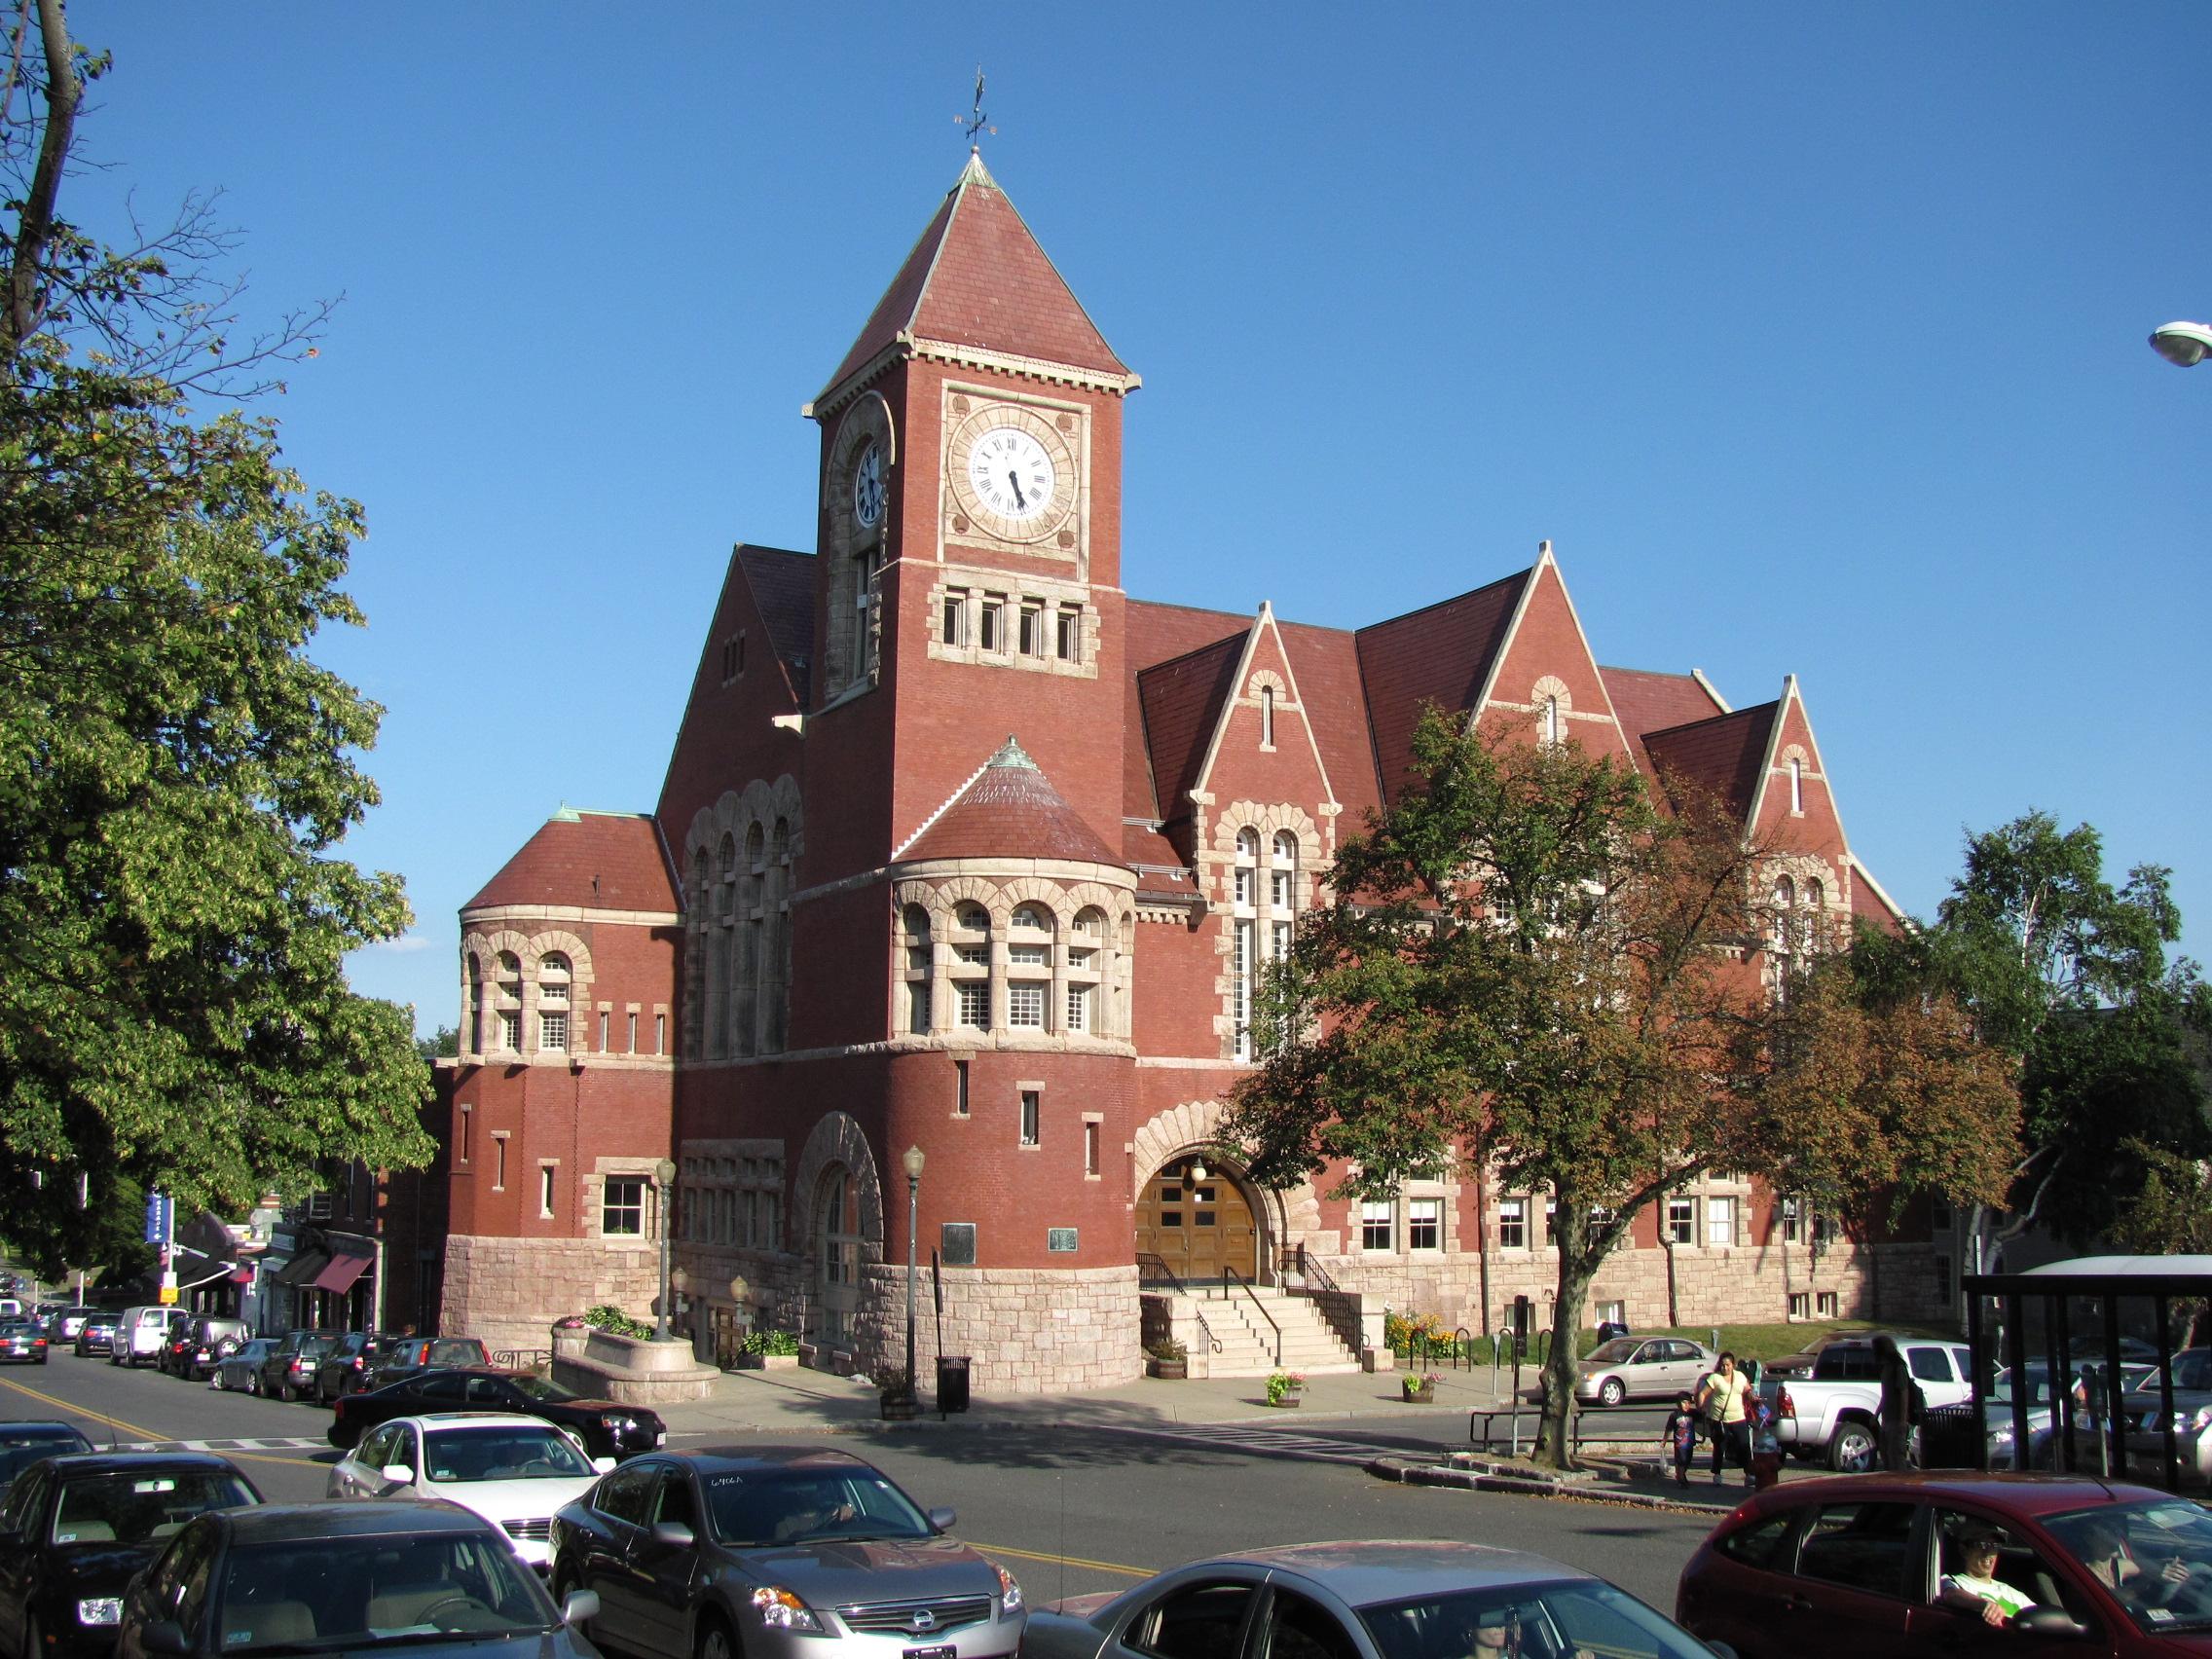 Town_Hall,_Amherst_MA.jpg